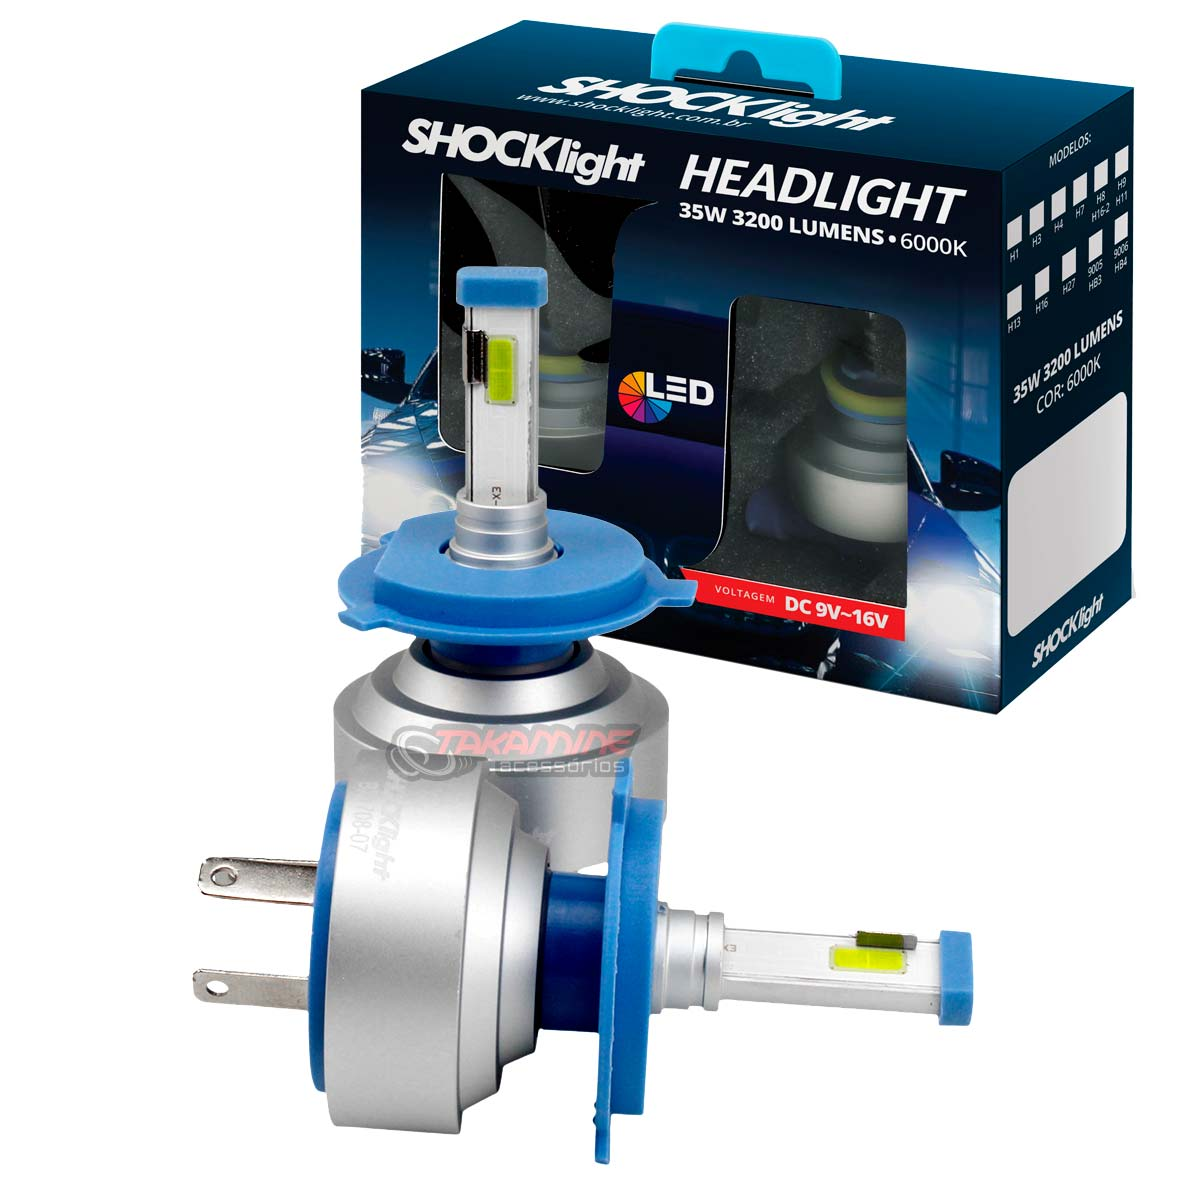 Kit LED Onix 2012 até 2020 tipo xenon modelo H4 35W encaixe original plug & play New Headlight